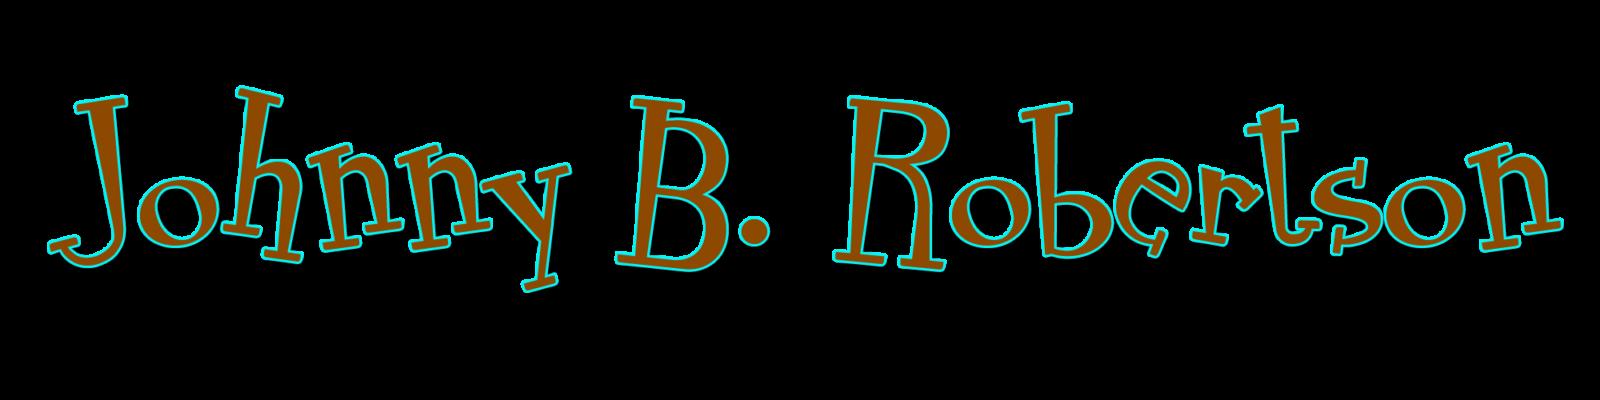 Johnny B. Robertson Johnny B. Robertson LOGOJOHNNY 1600x400